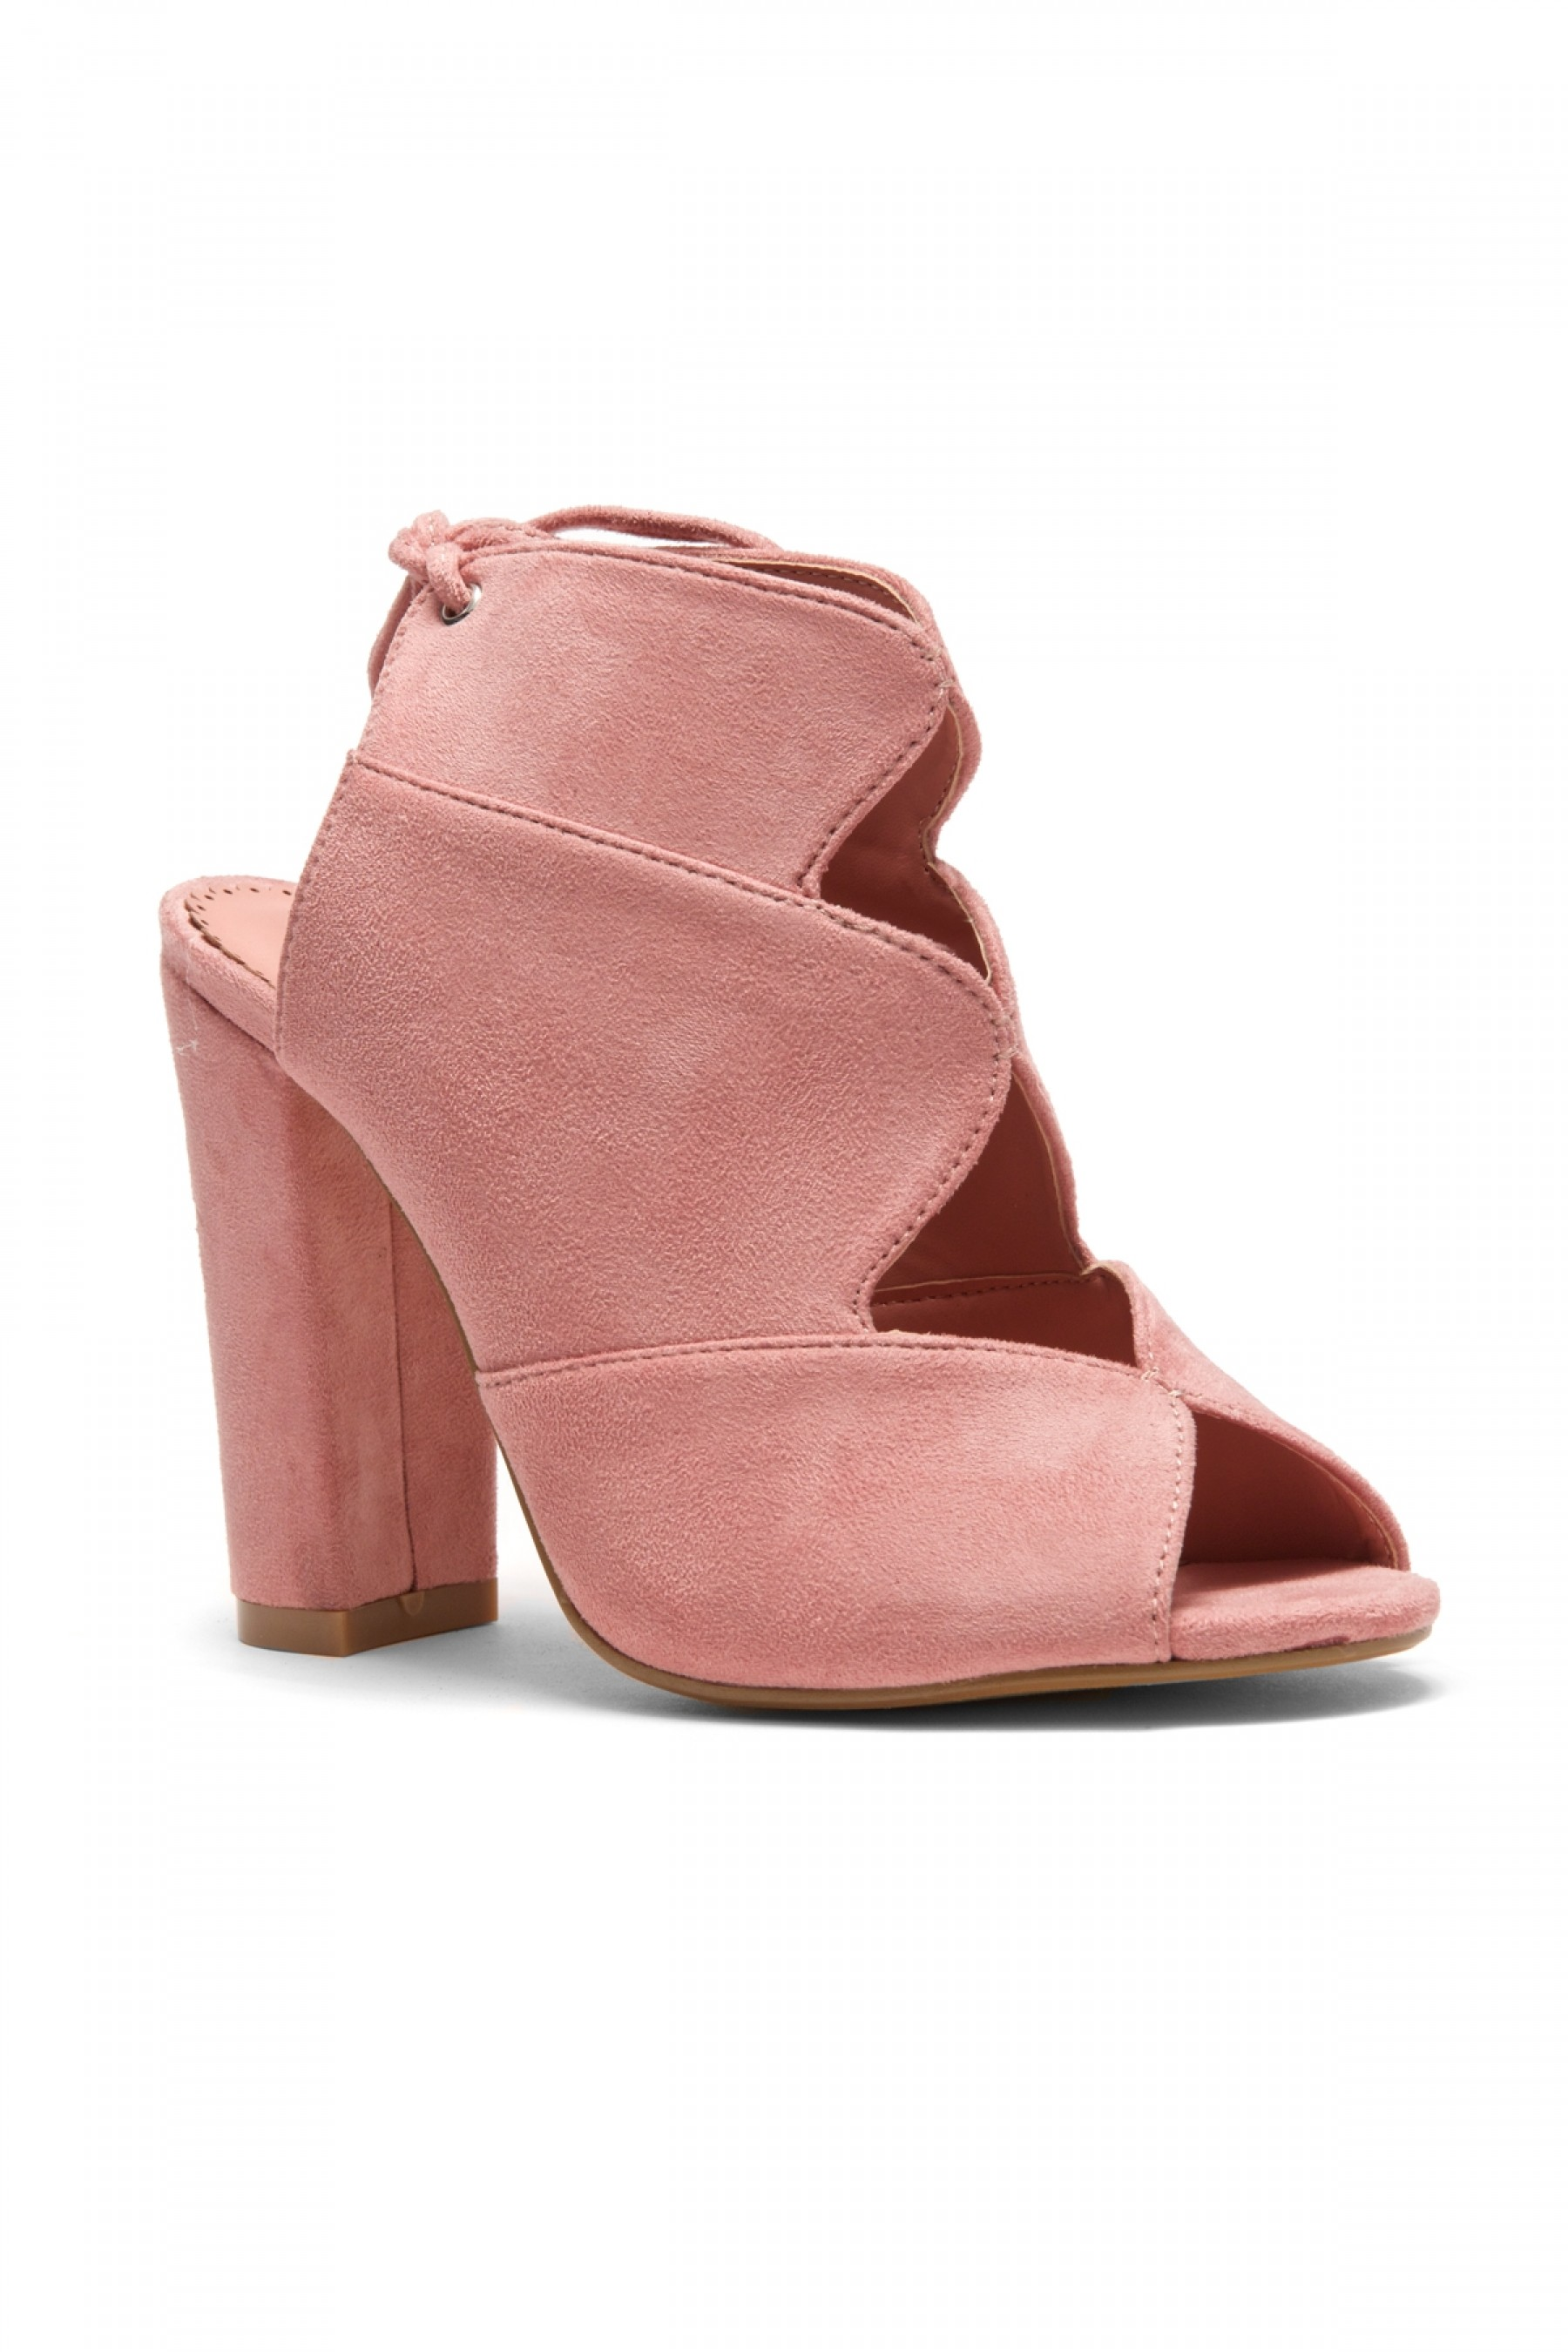 HerStyle Mocha Laser Cut, Chunky Heeled Sandals (Mauve)